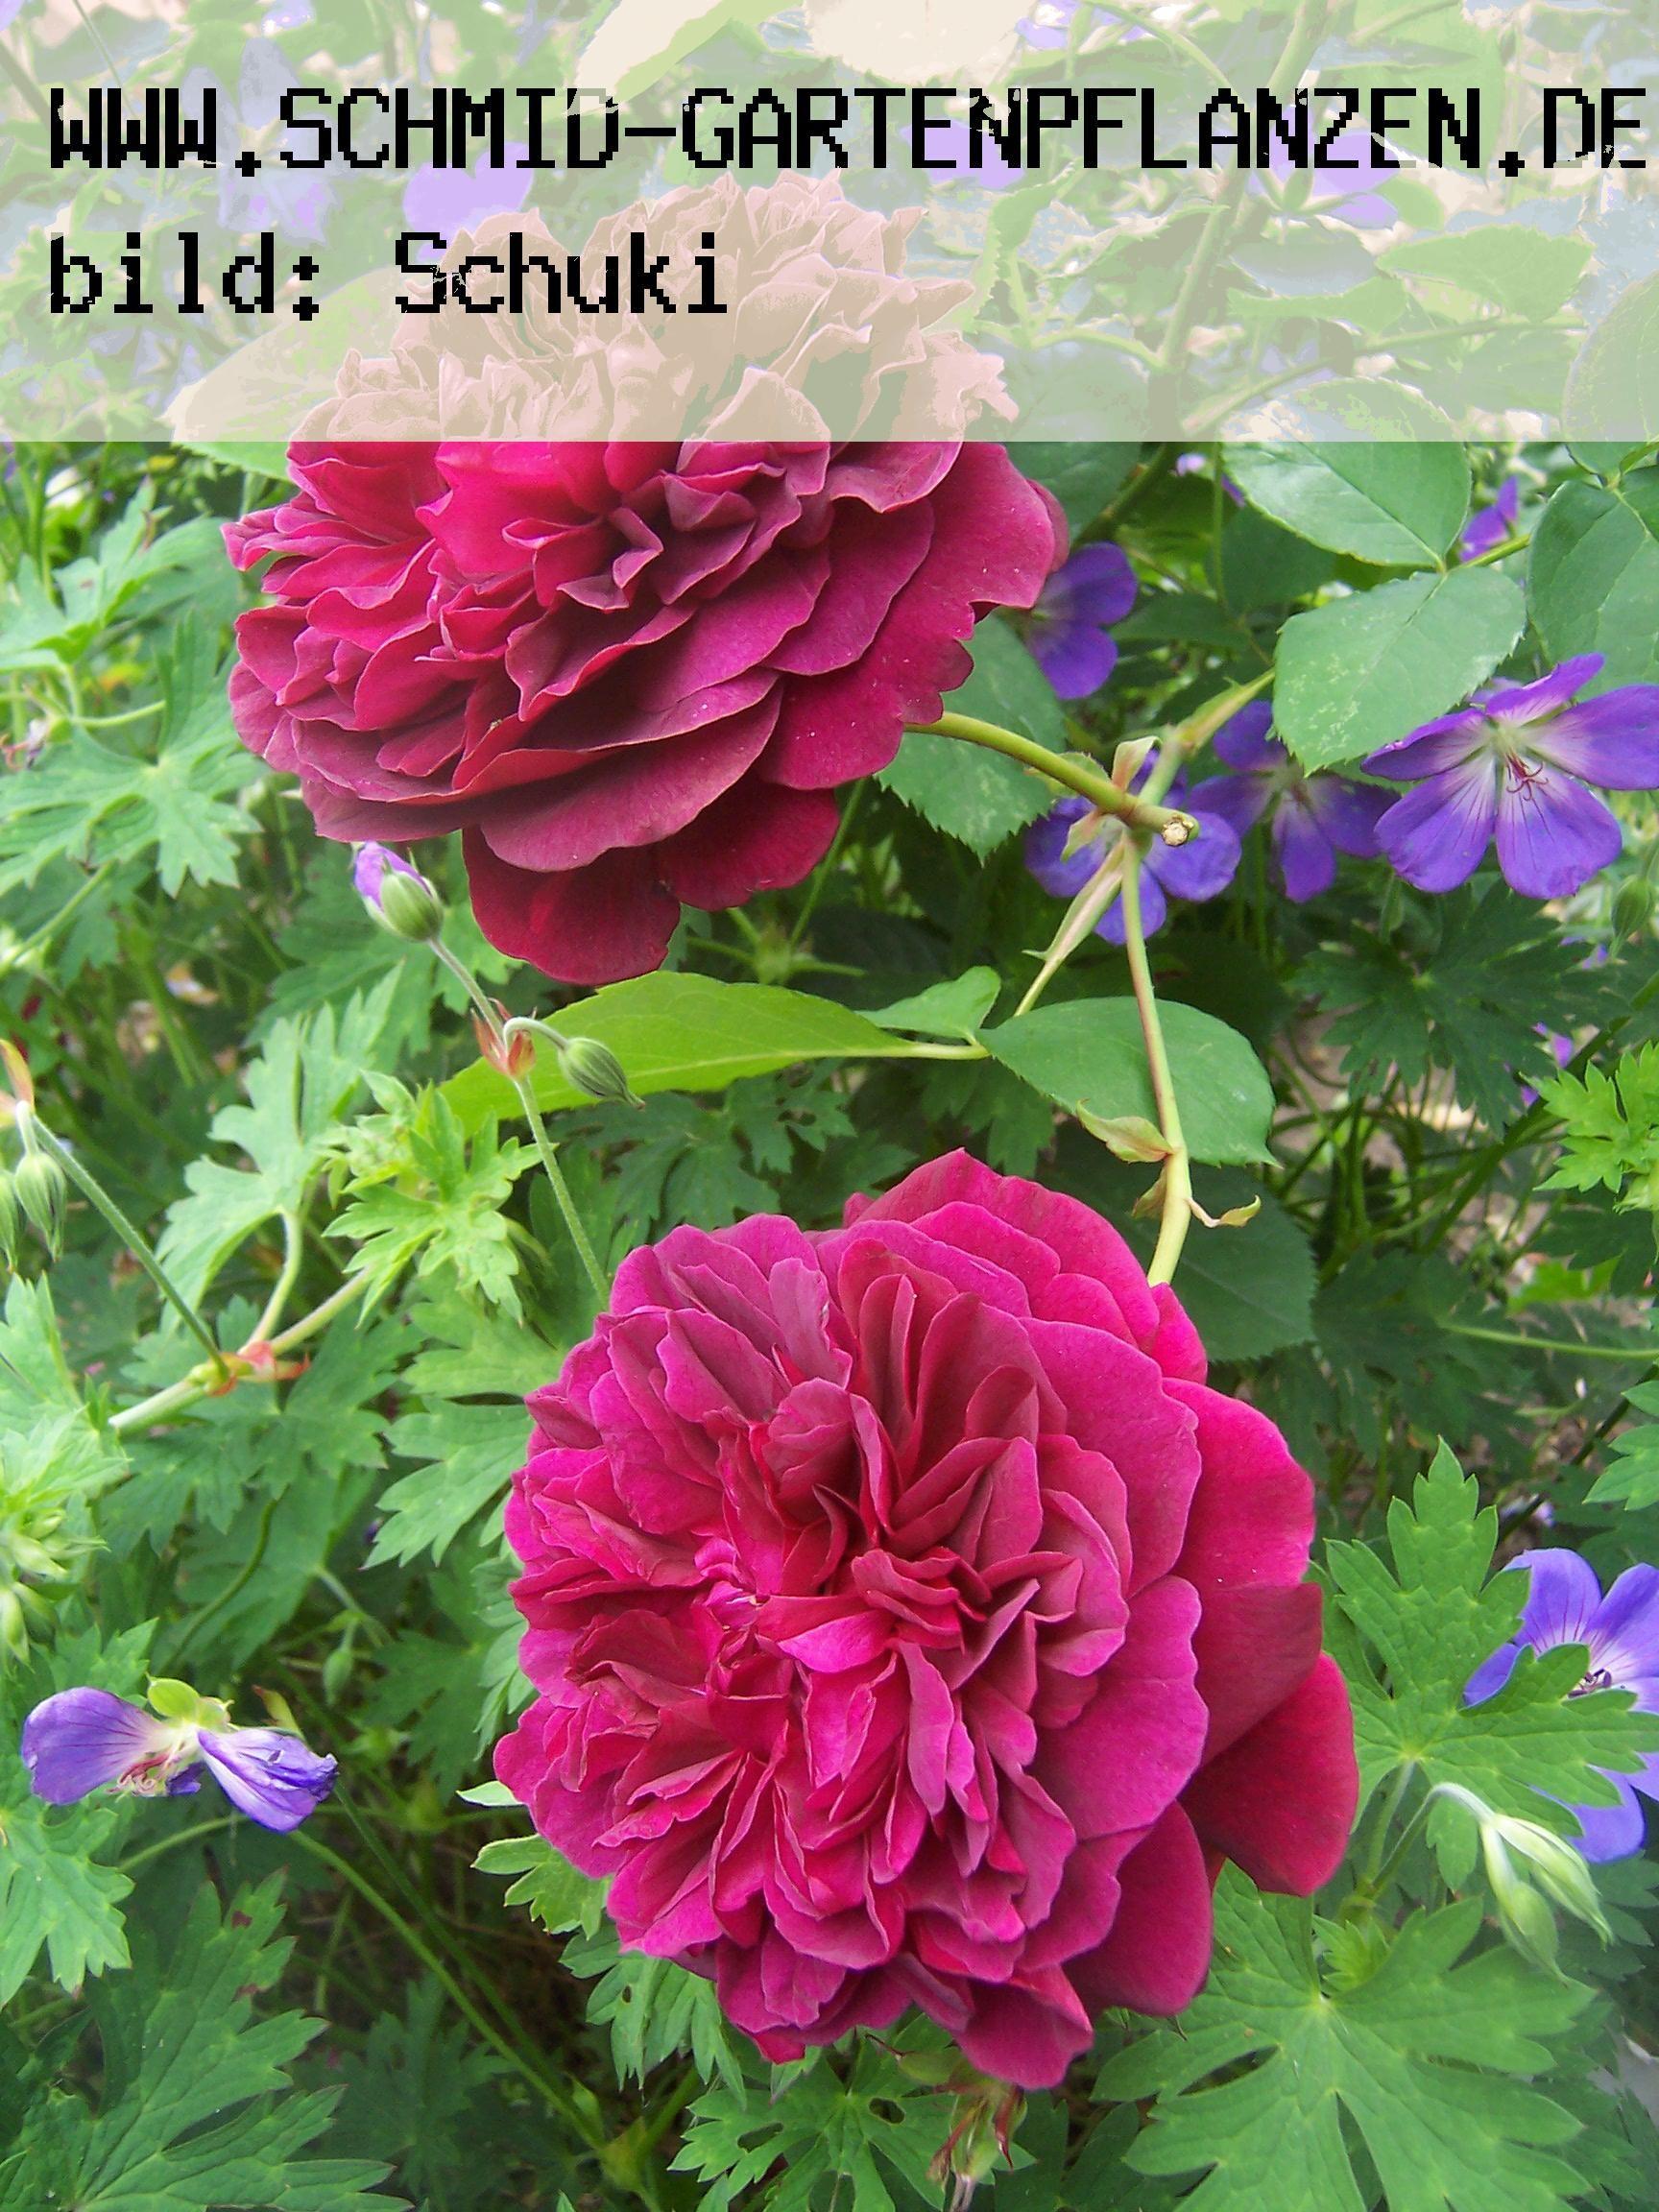 william shakespeare englische rosen ab 10 90 www. Black Bedroom Furniture Sets. Home Design Ideas